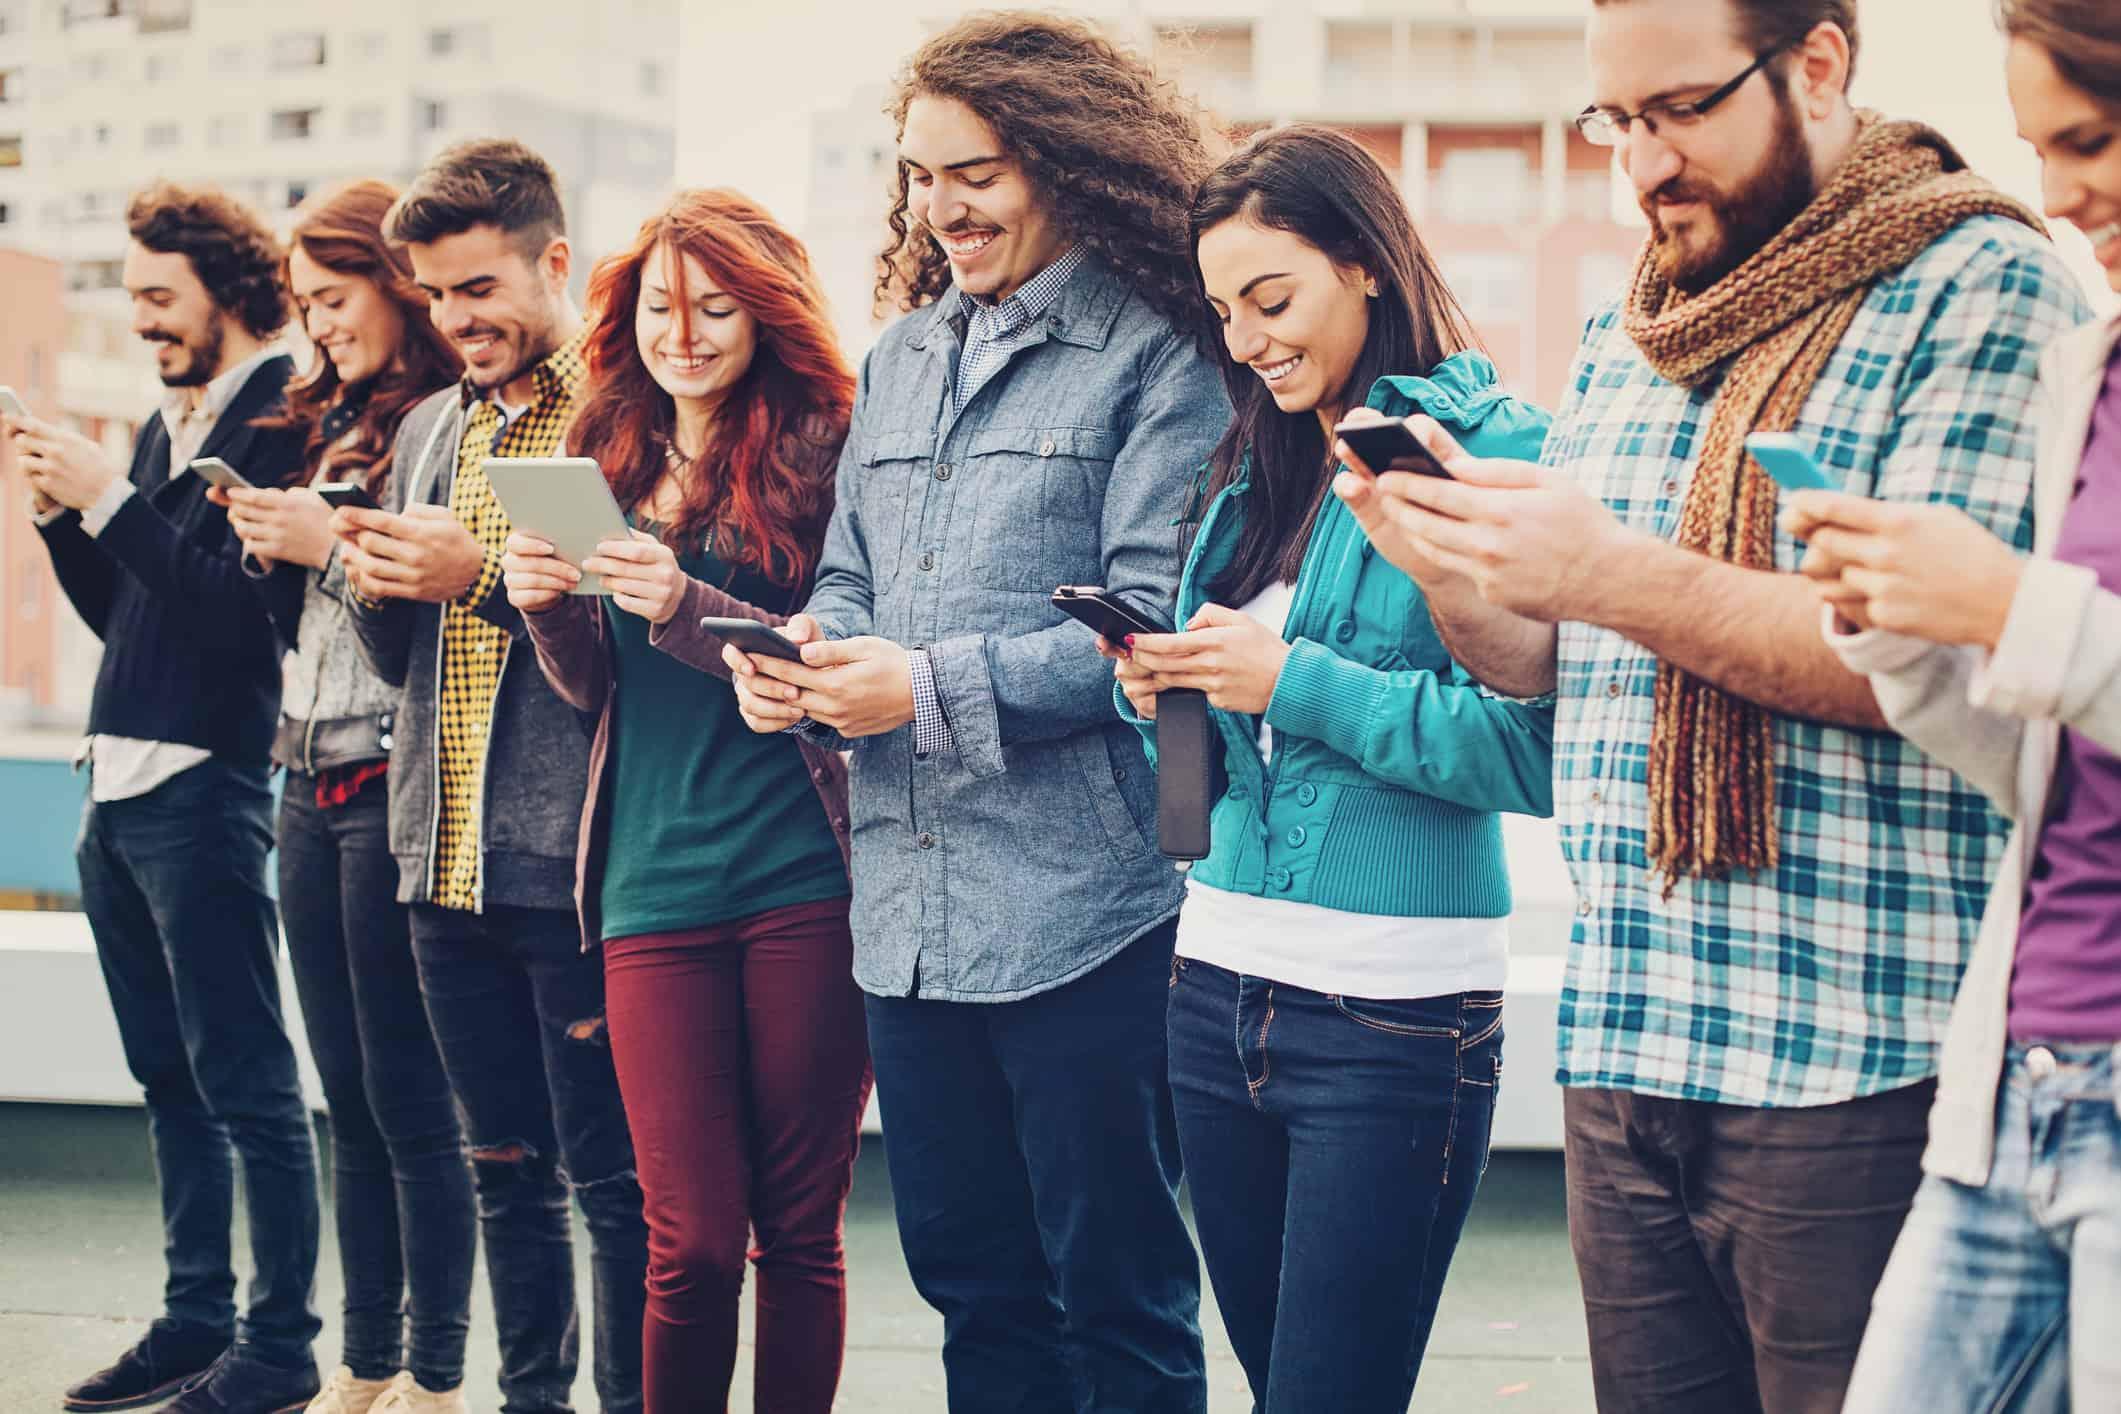 Millennials shop online for the holidays